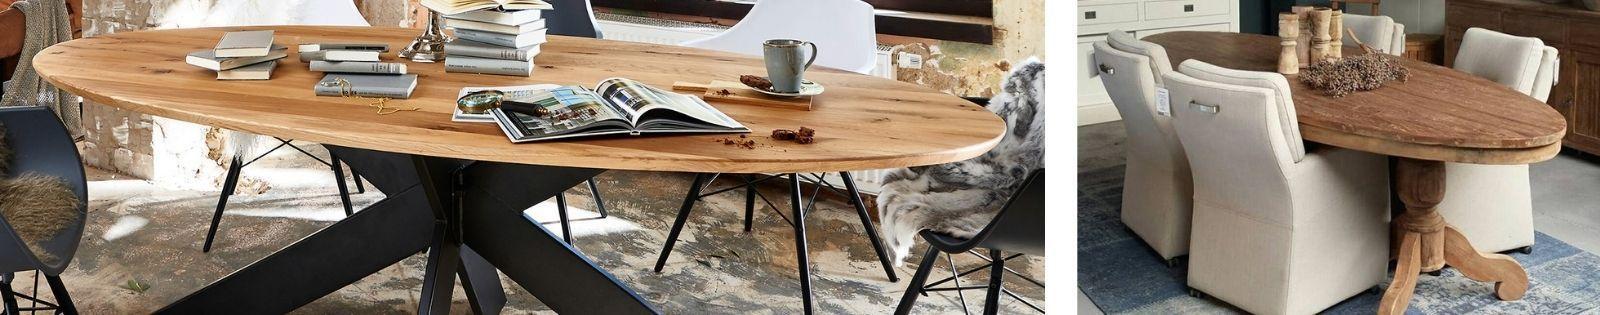 Table de repas ovale en bois massif : acacia, chêne, hévéa, teck, manguier